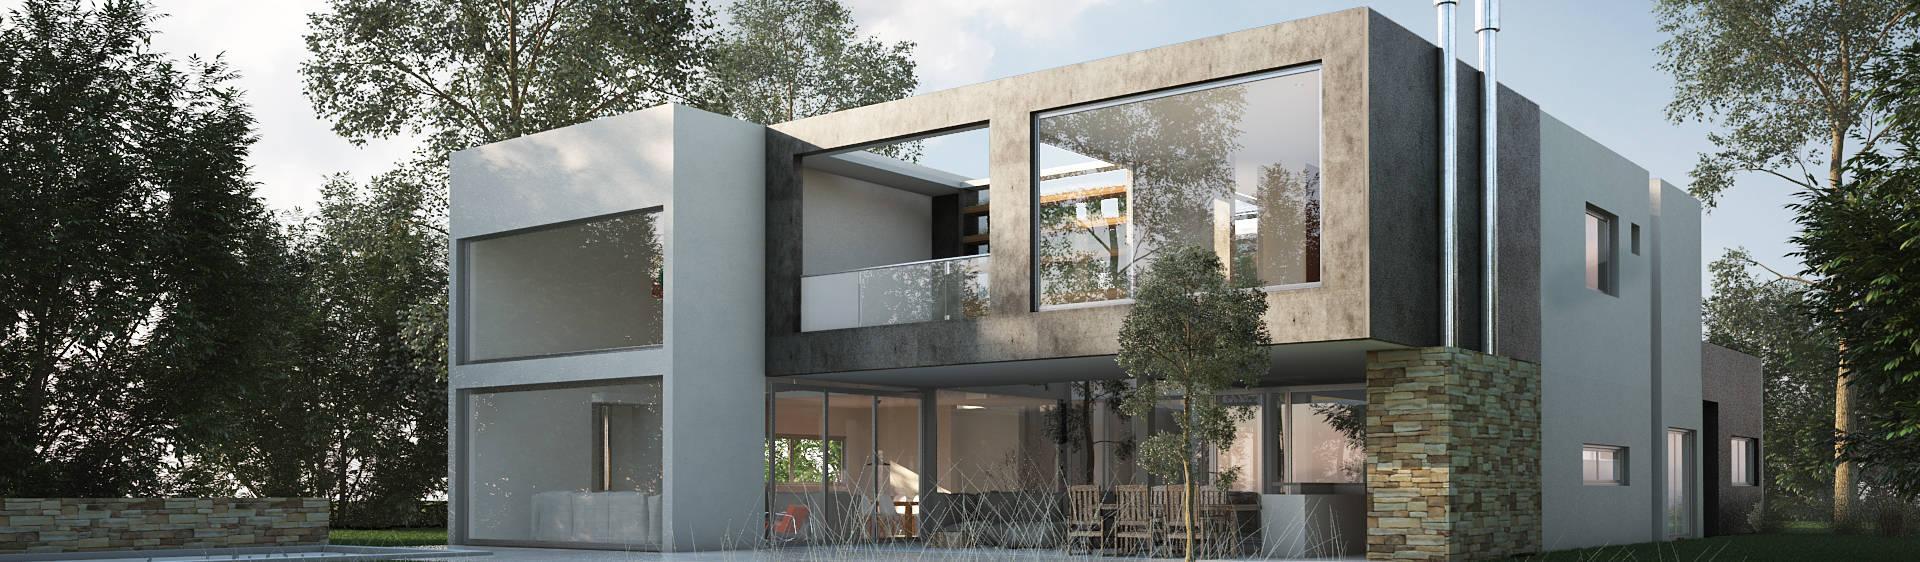 Estudio Medan Arquitectos